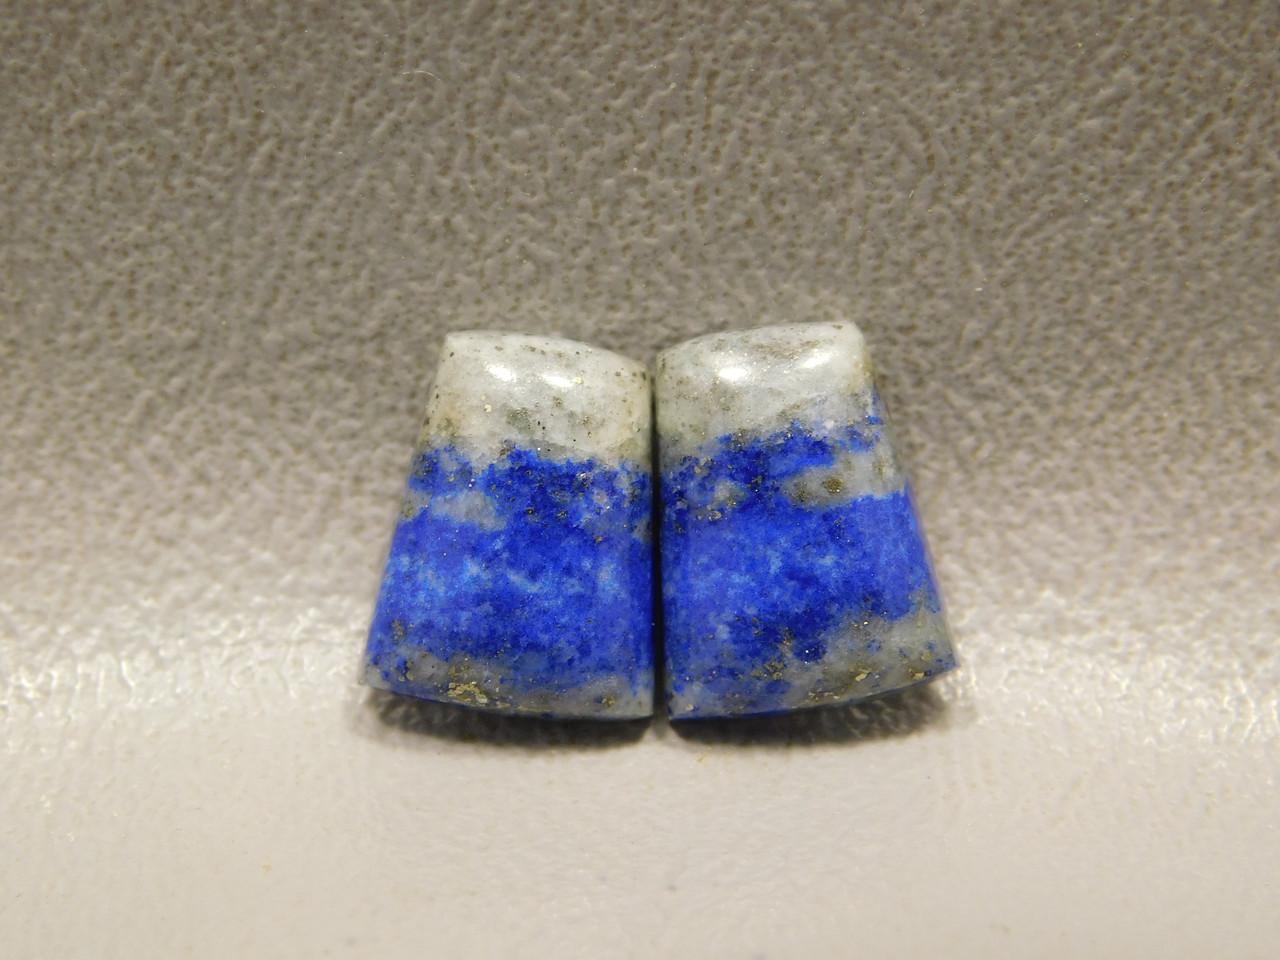 Blue Stone Lapis Cabochons Small Matched Pairs Trapezoids #23